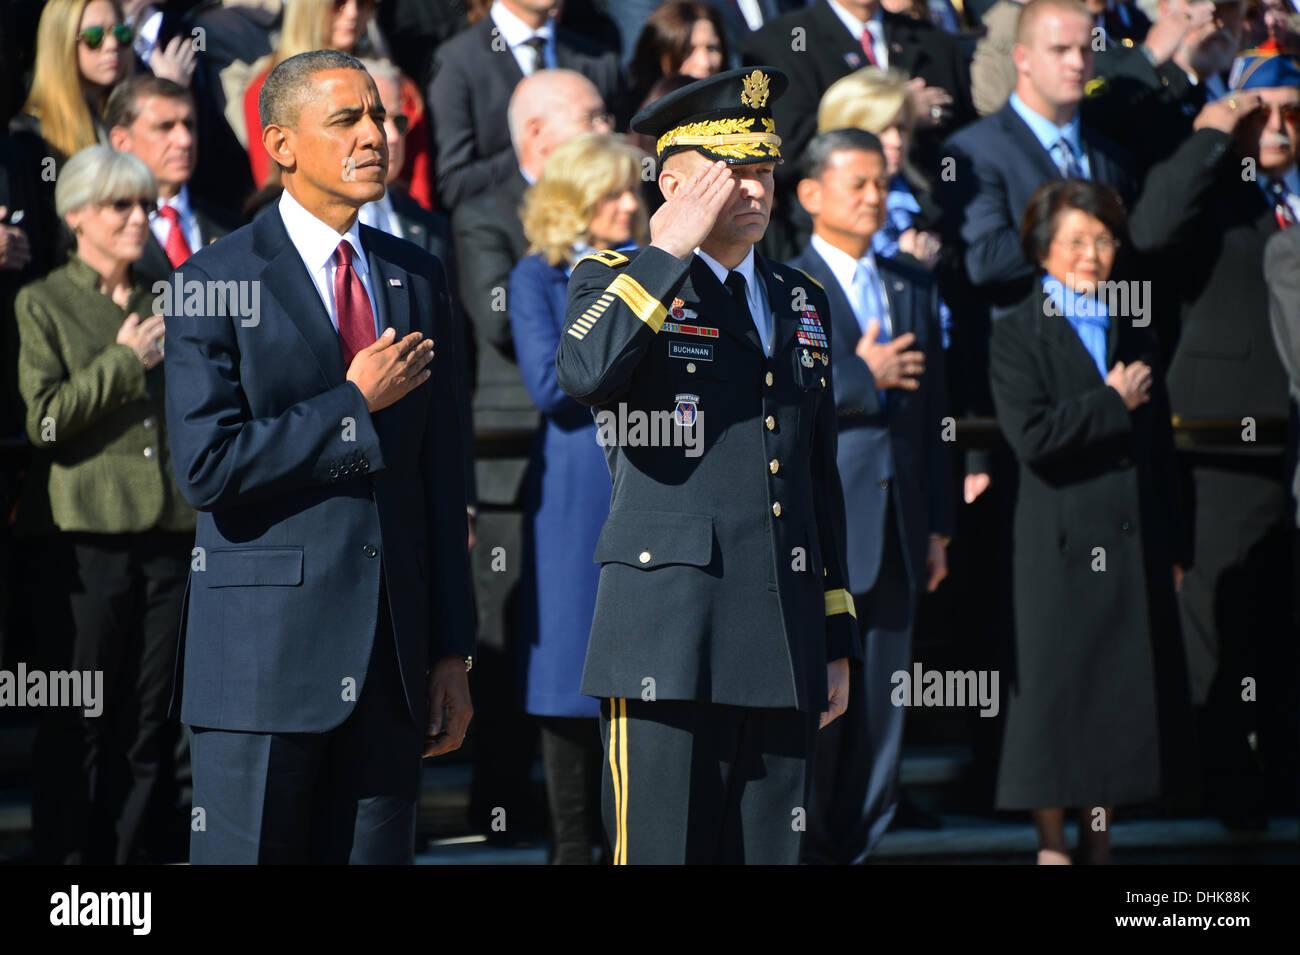 US President Barack Obama and Commanding General, U.S. Army Military District of Washington Maj. Gen. Jeffrey Buchanan during ceremonies to honor veterans at Arlington National Cemetery in honor of Veterans Day November 11, 2013 in Arlington, VA. - Stock Image